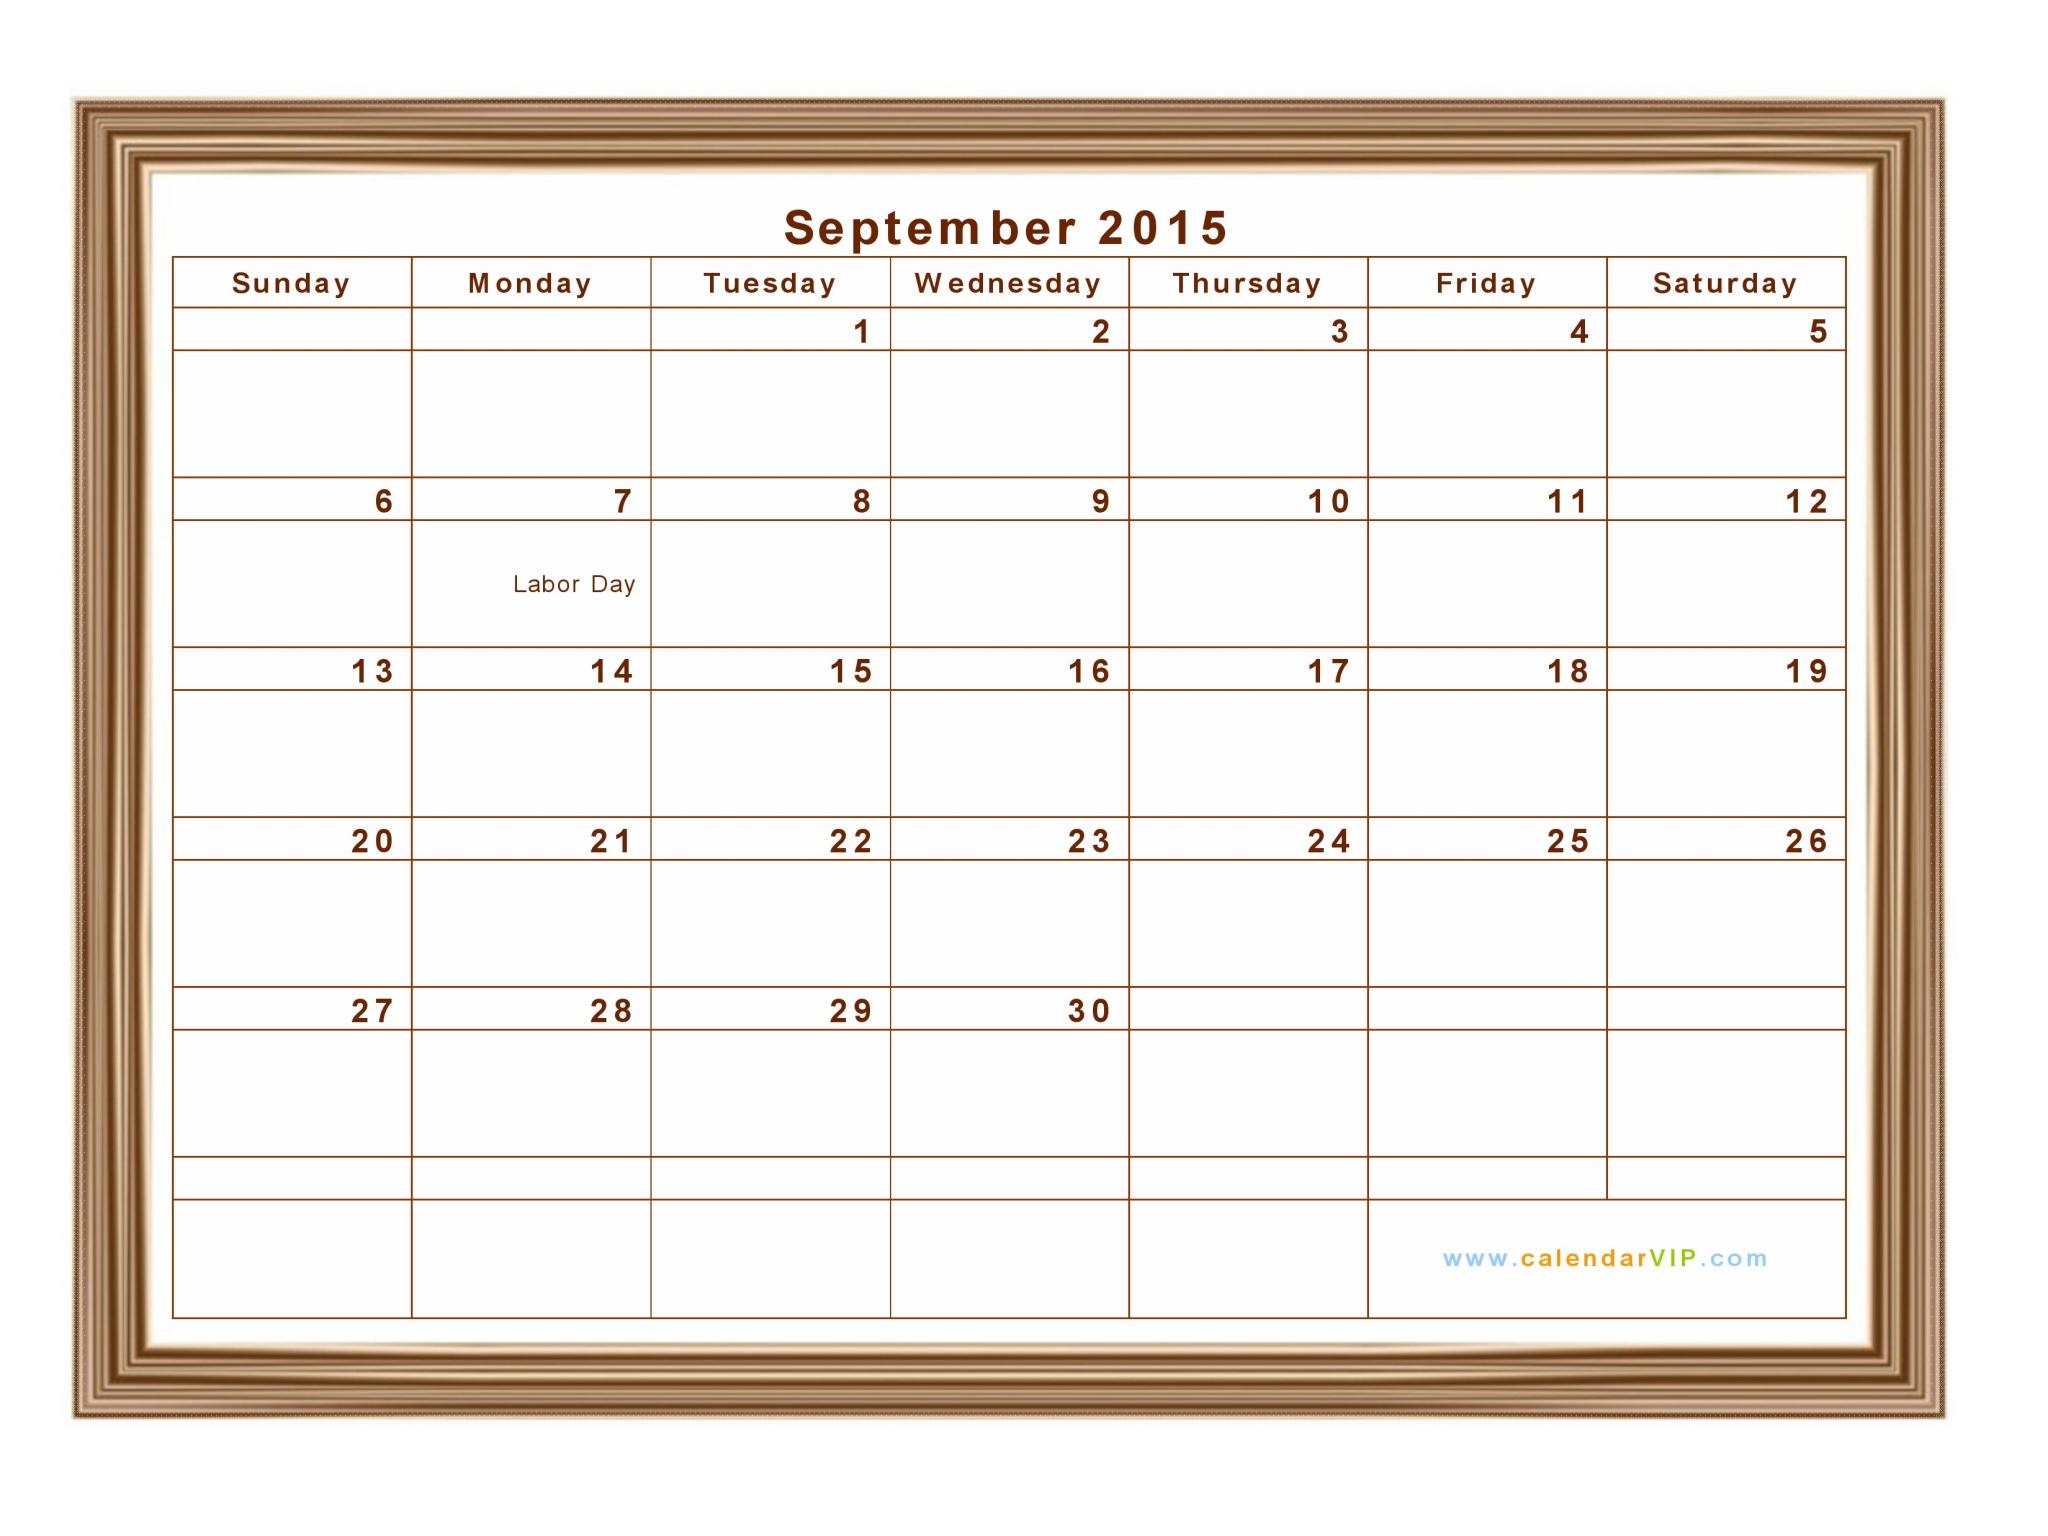 September 2015 Calendar - Blank Printable Calendar Template in PDF ...